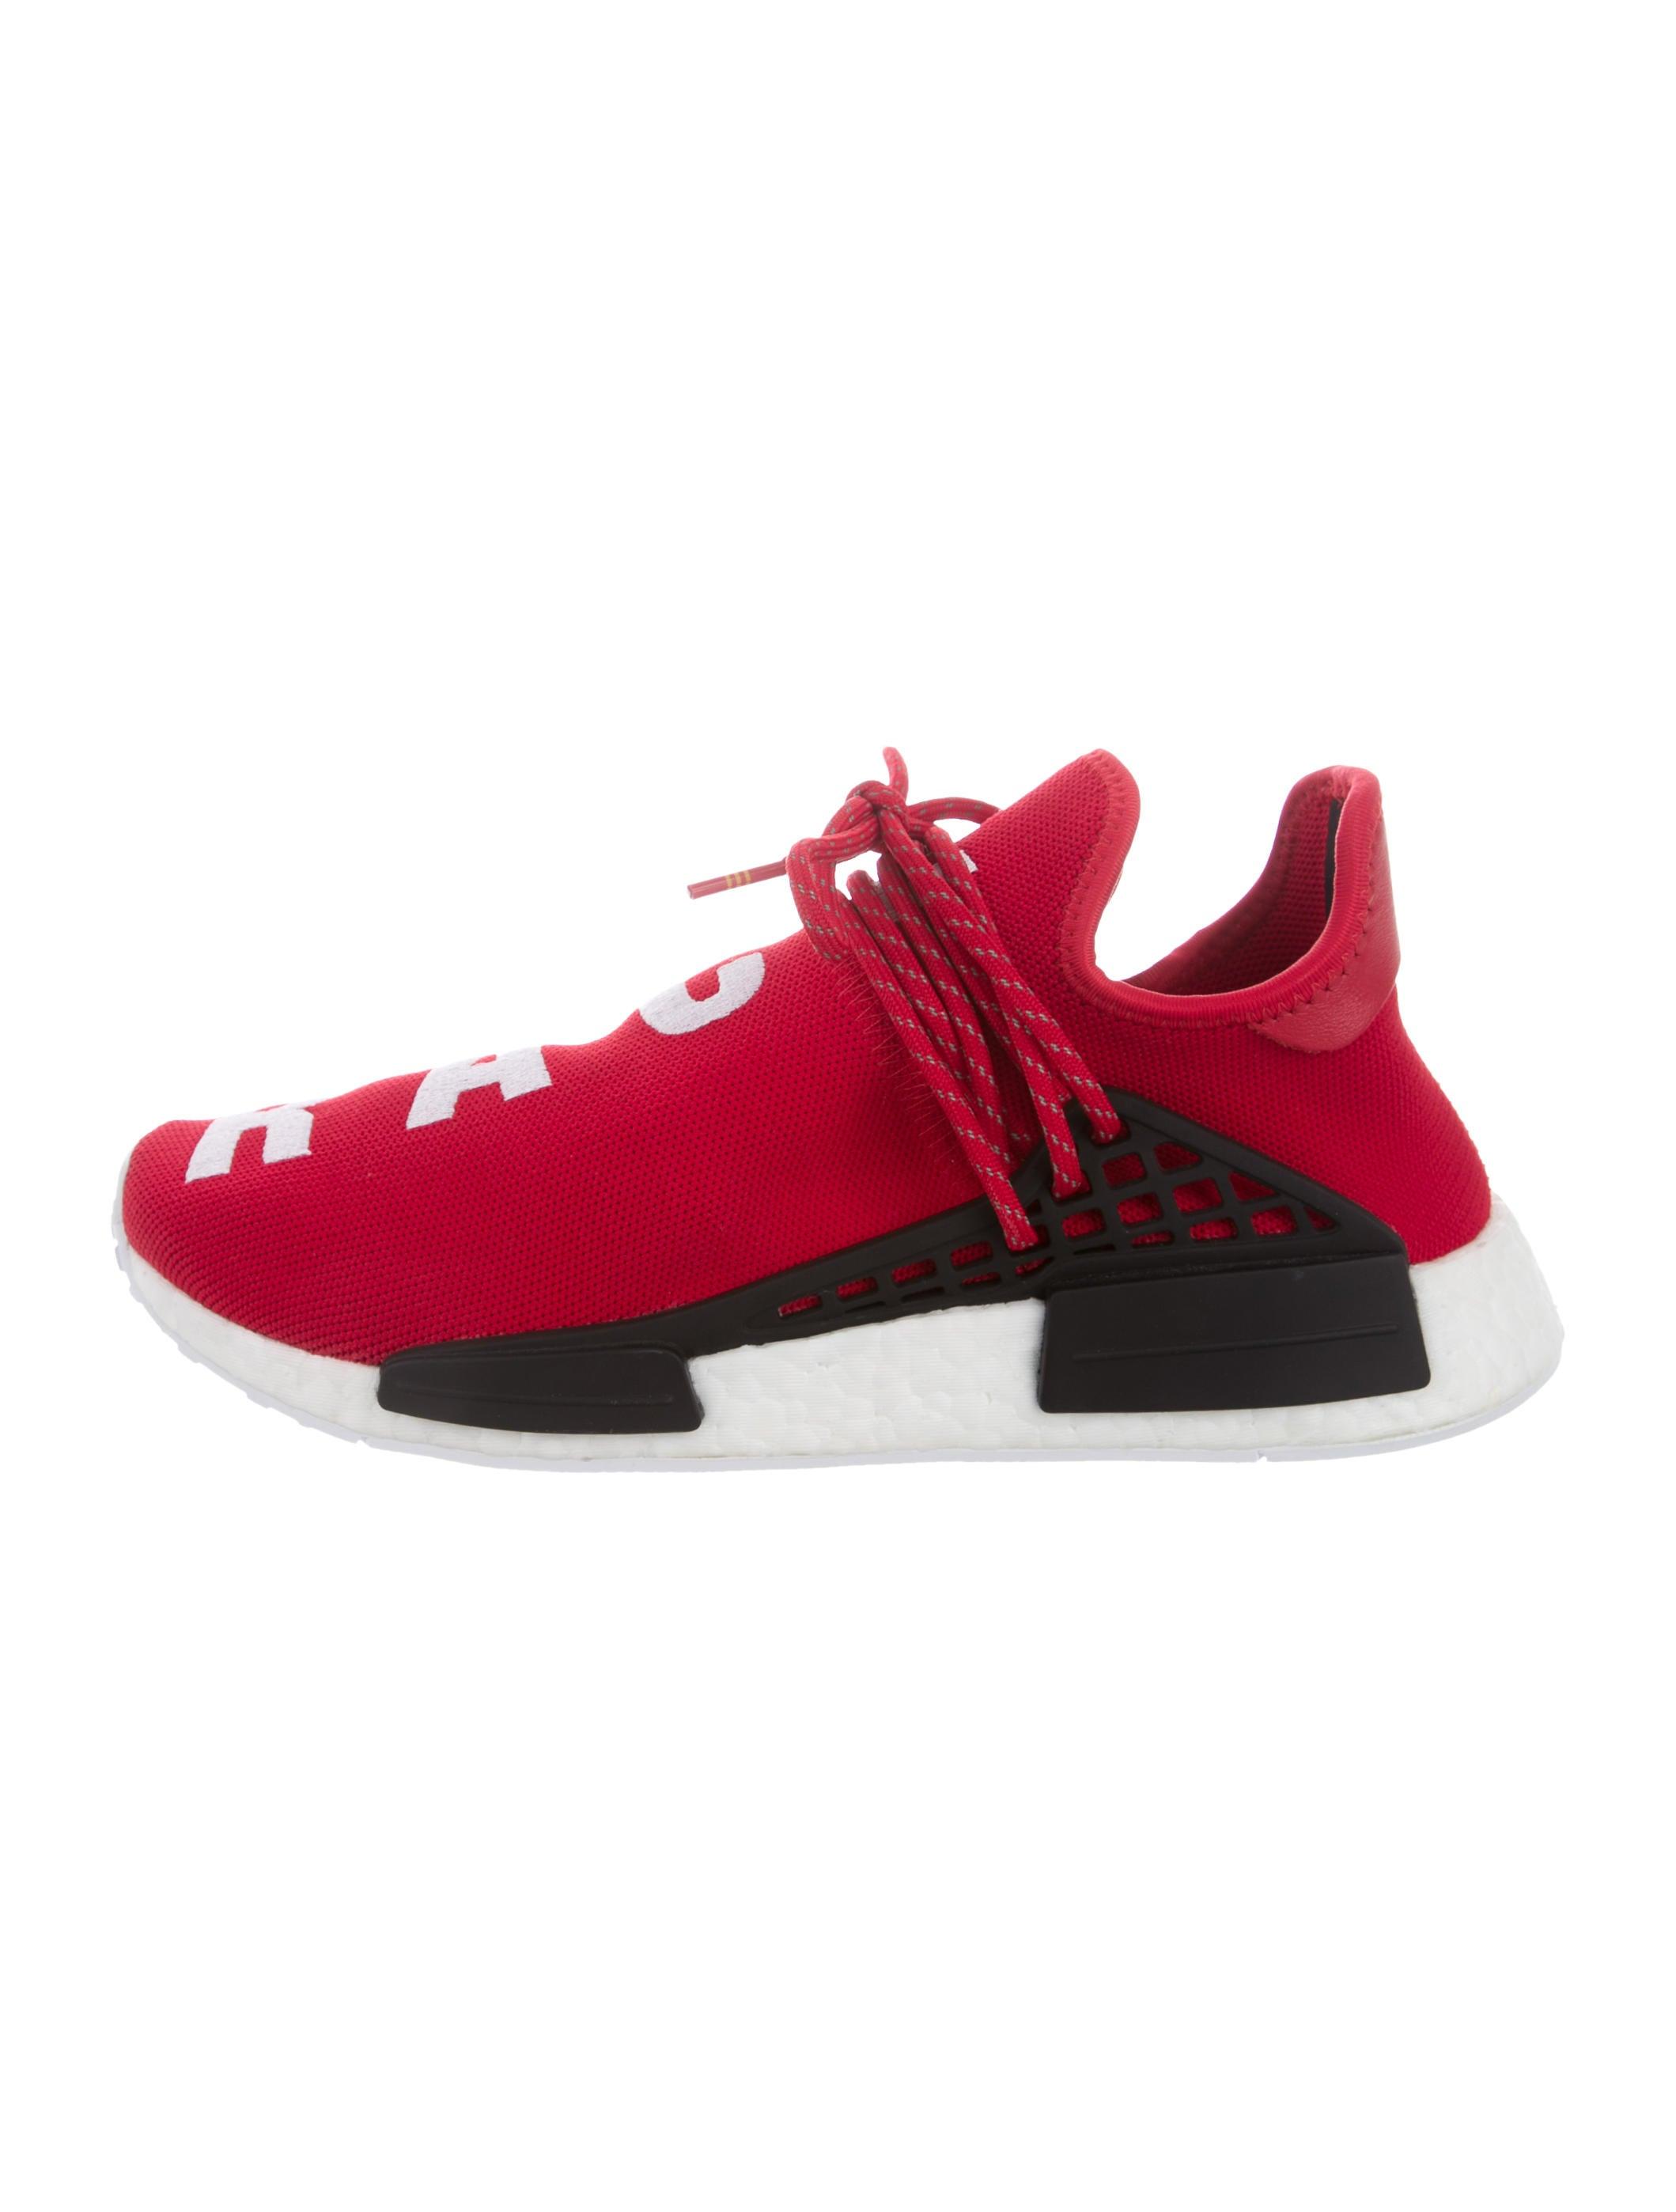 Pharrell Williams x NMD HU Human Race Sneakers